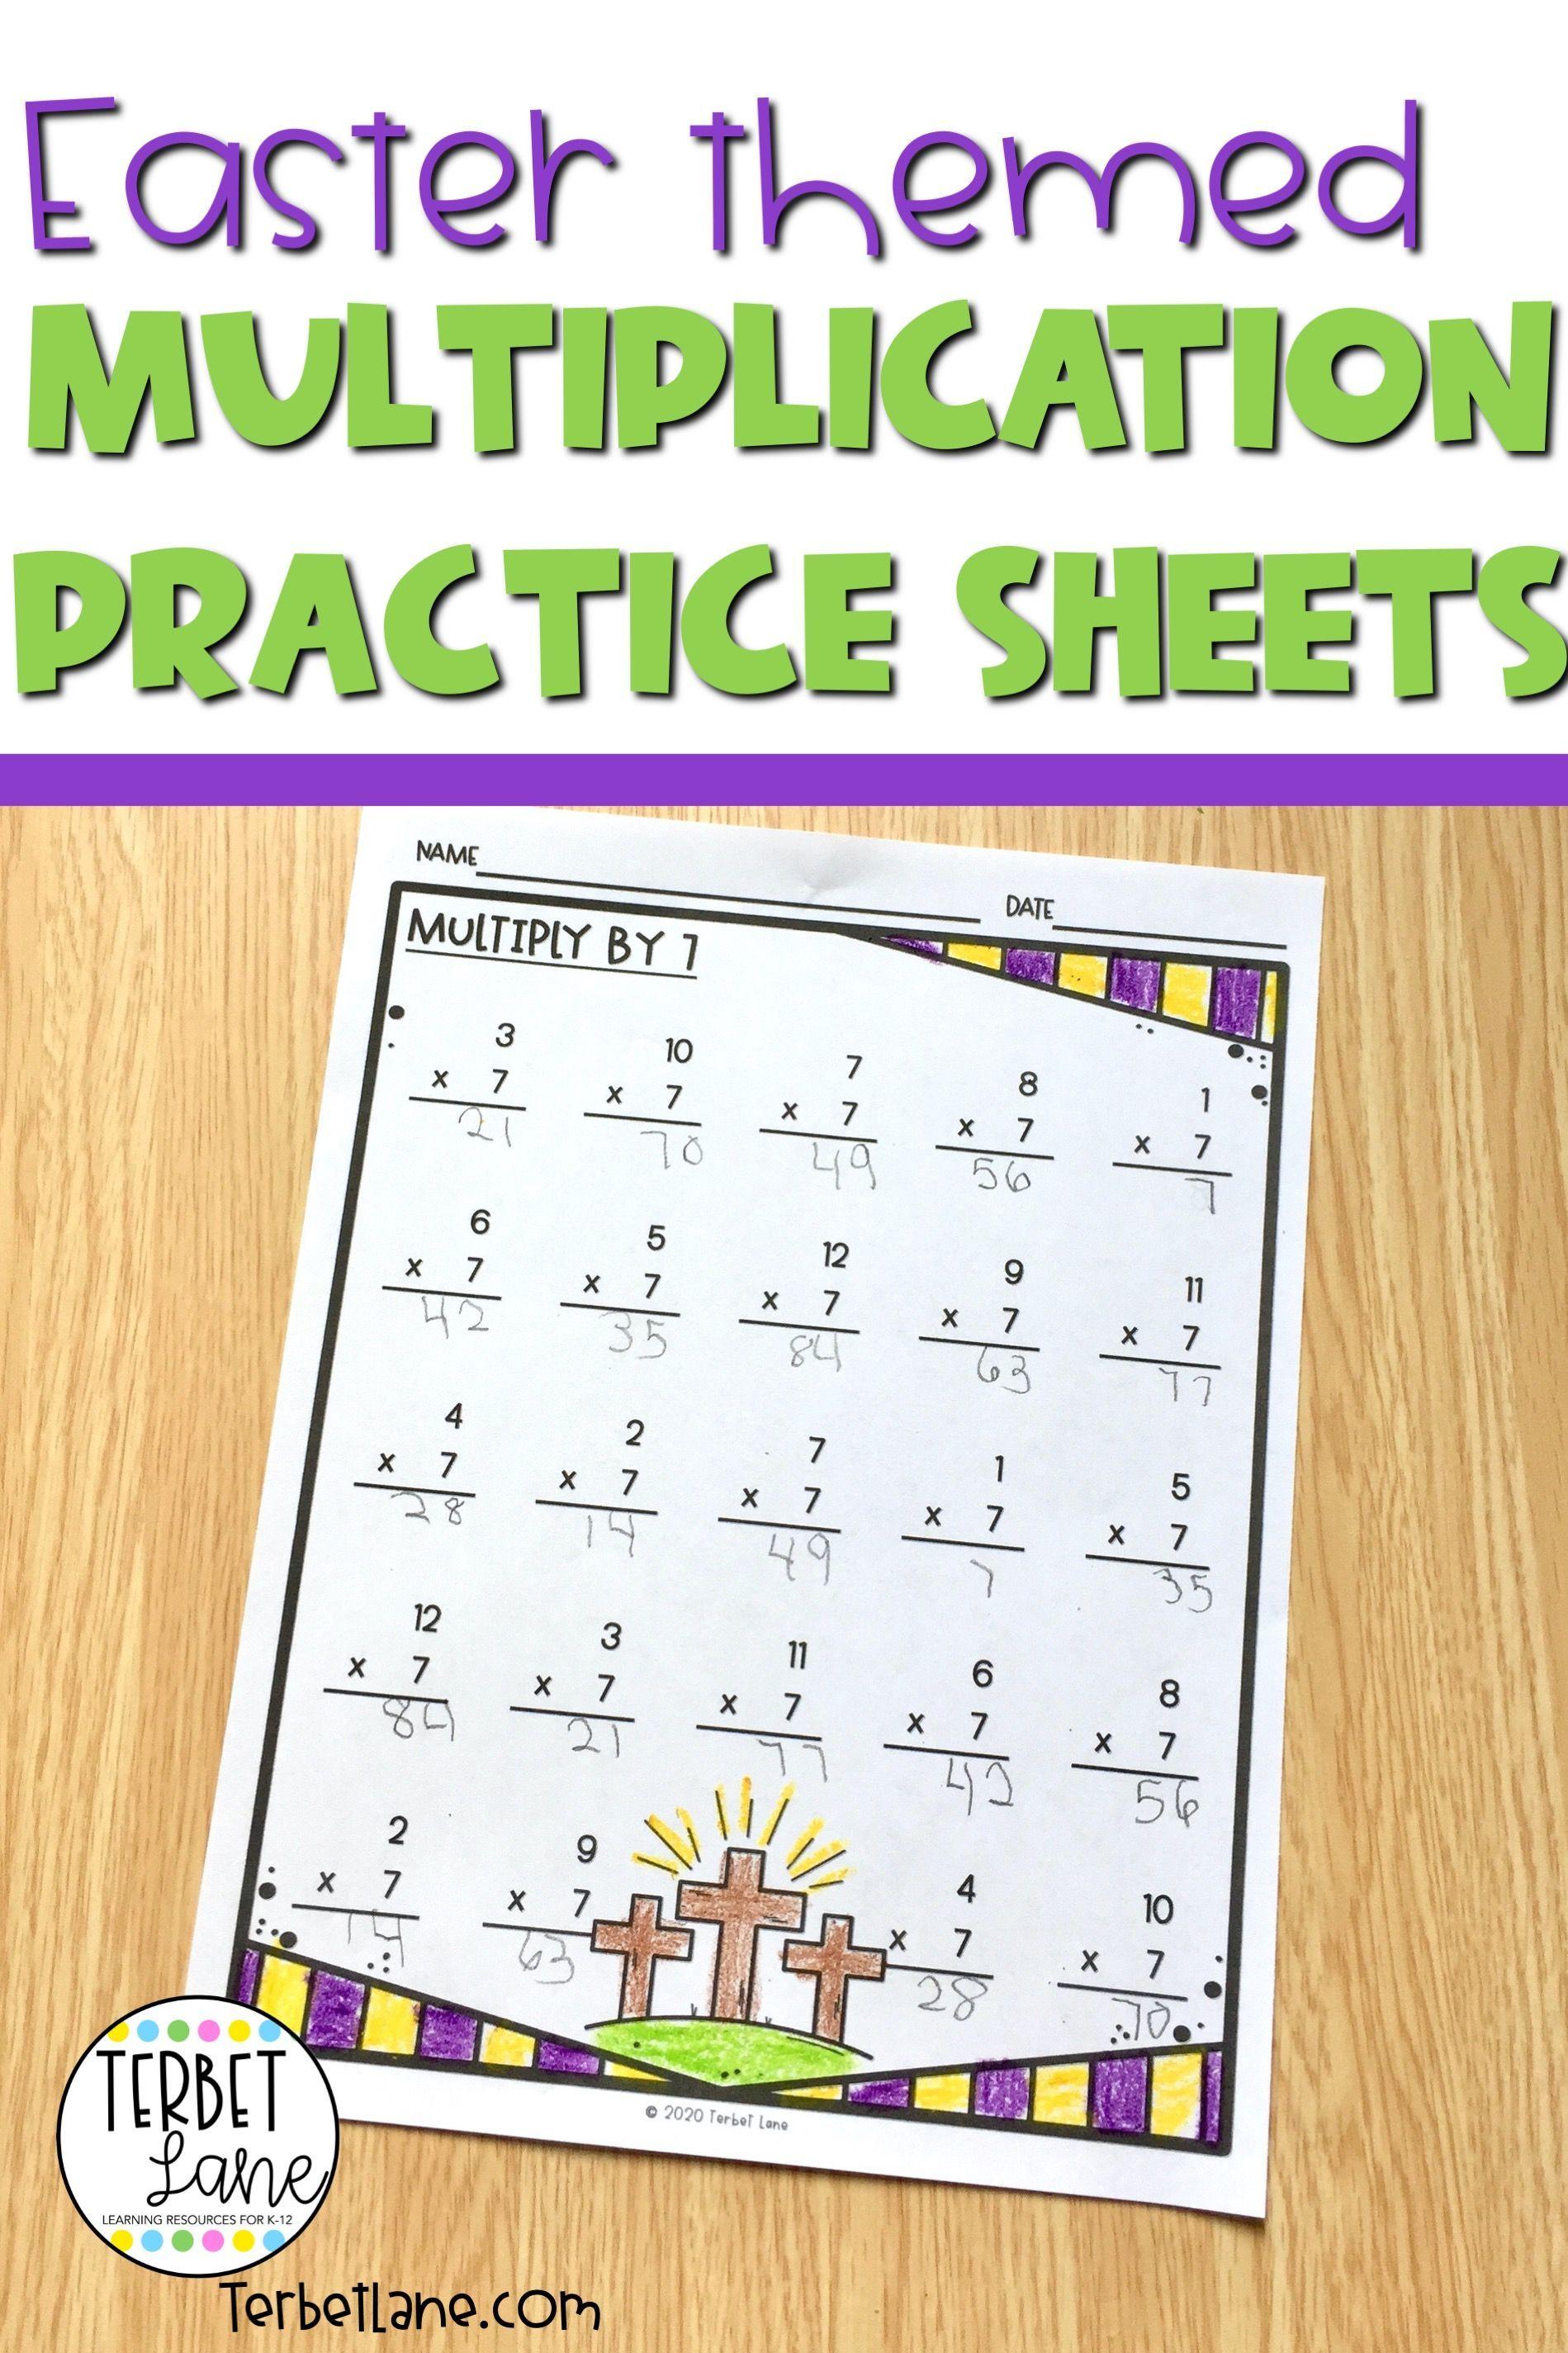 Easter Multiplication Worksheets In